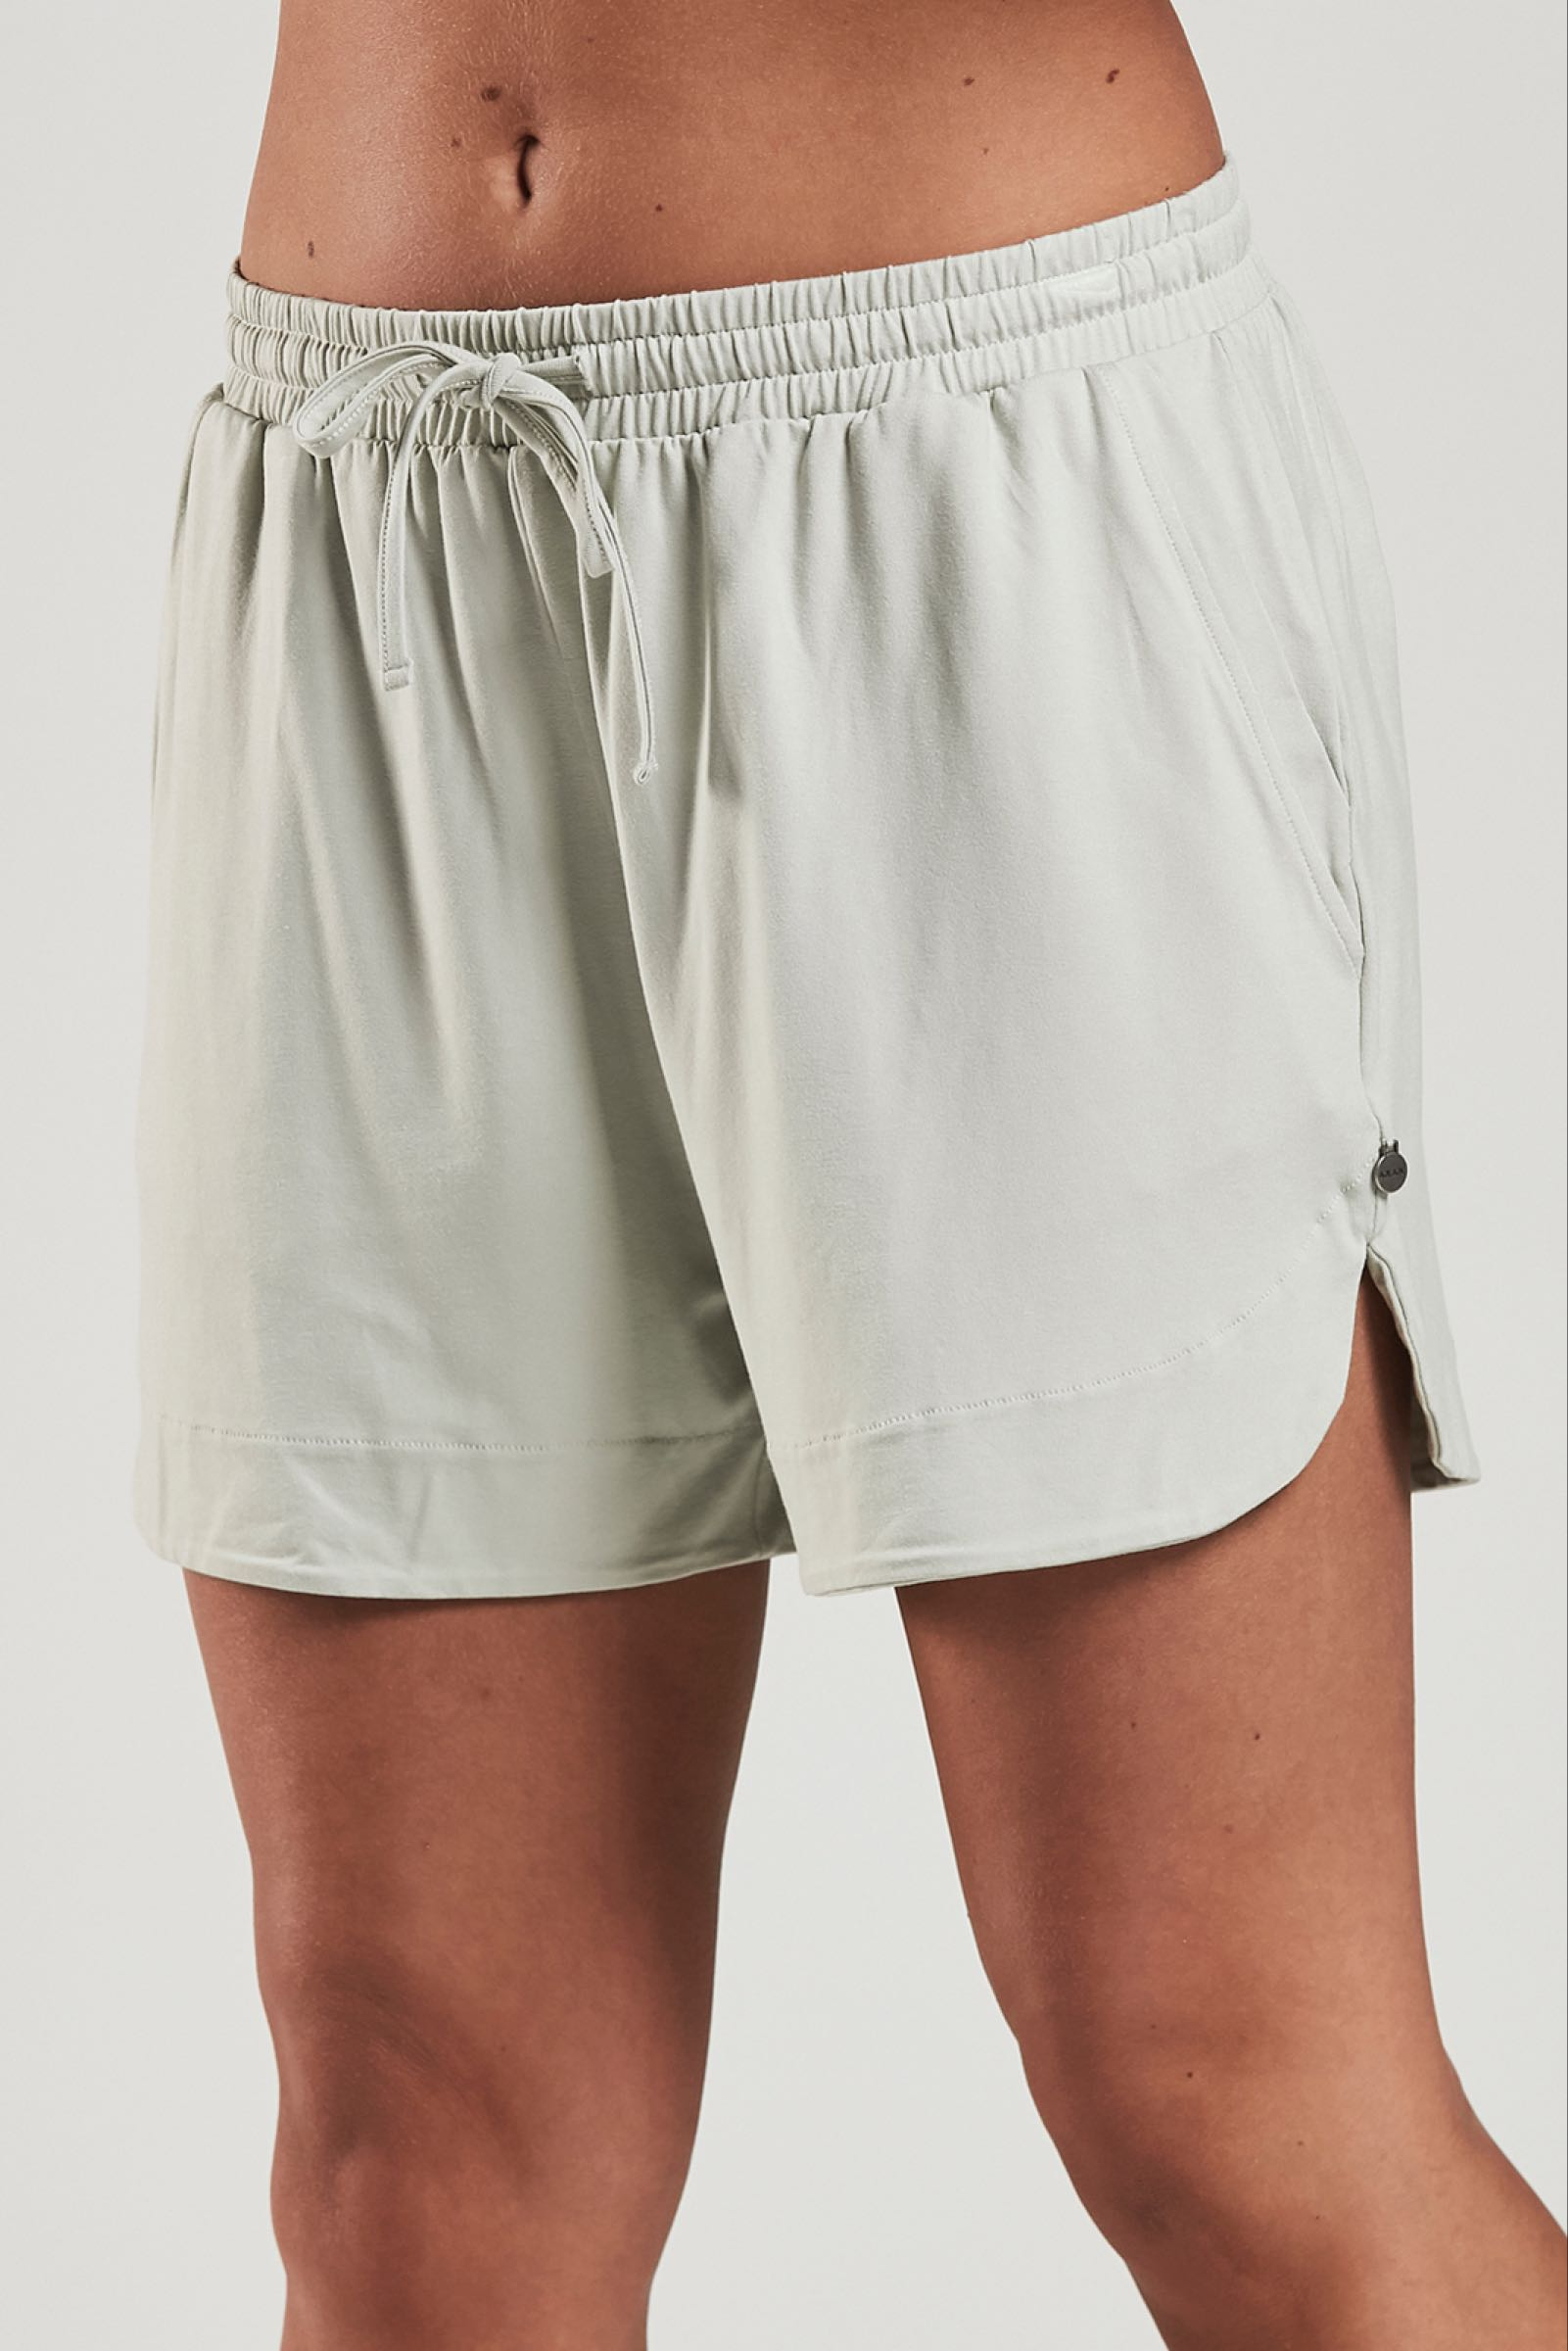 Ajlajk shorts, Milky green